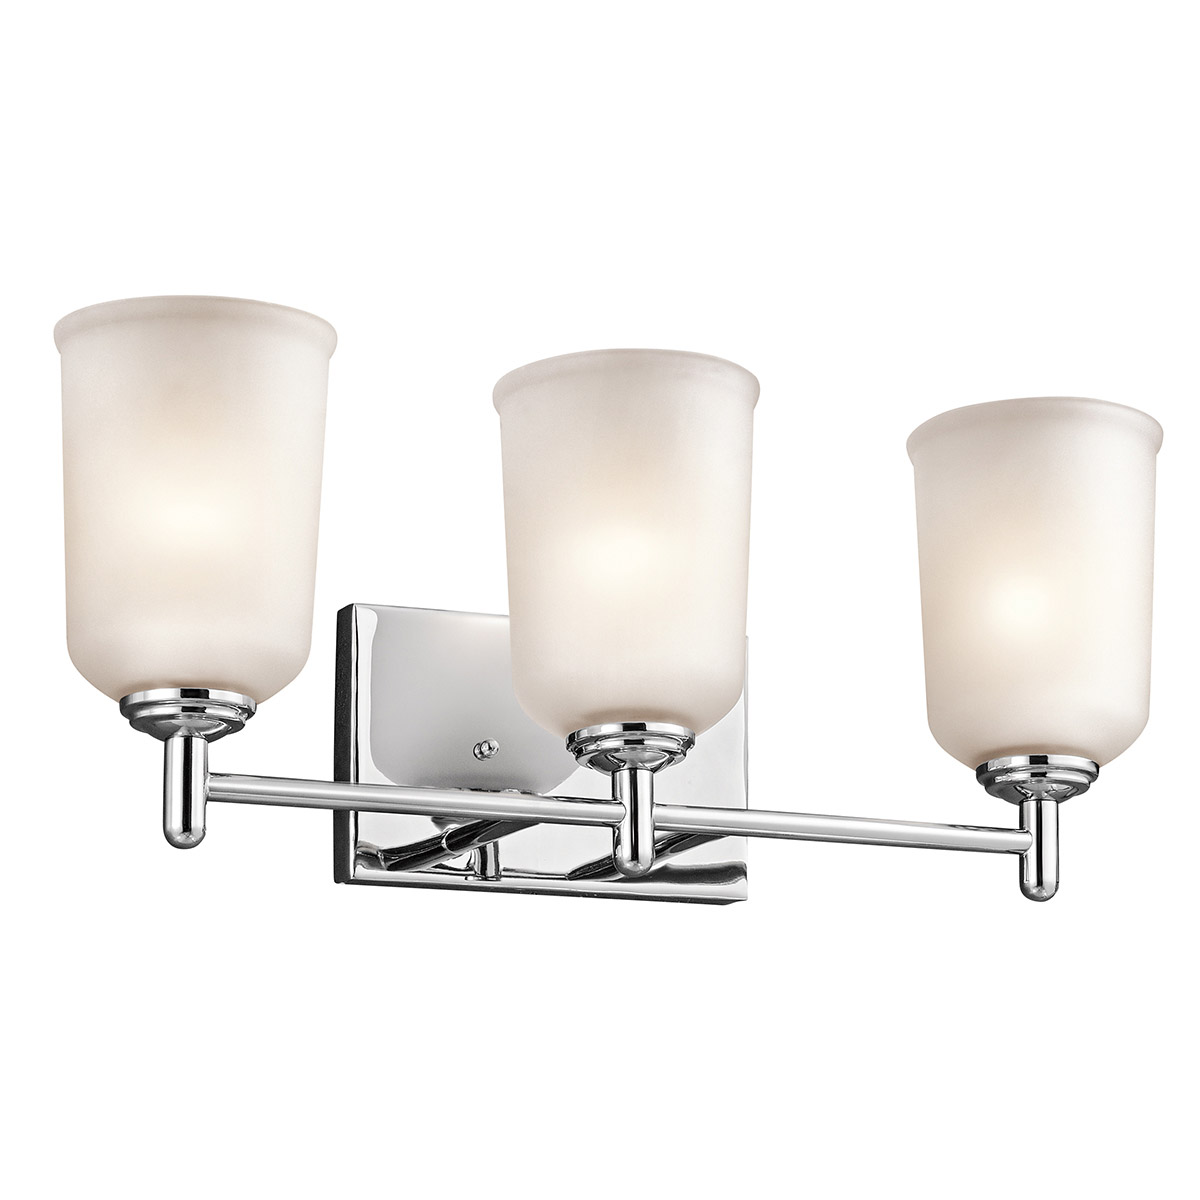 Kichler 45574CH Shailene Bathroom Vanity Light